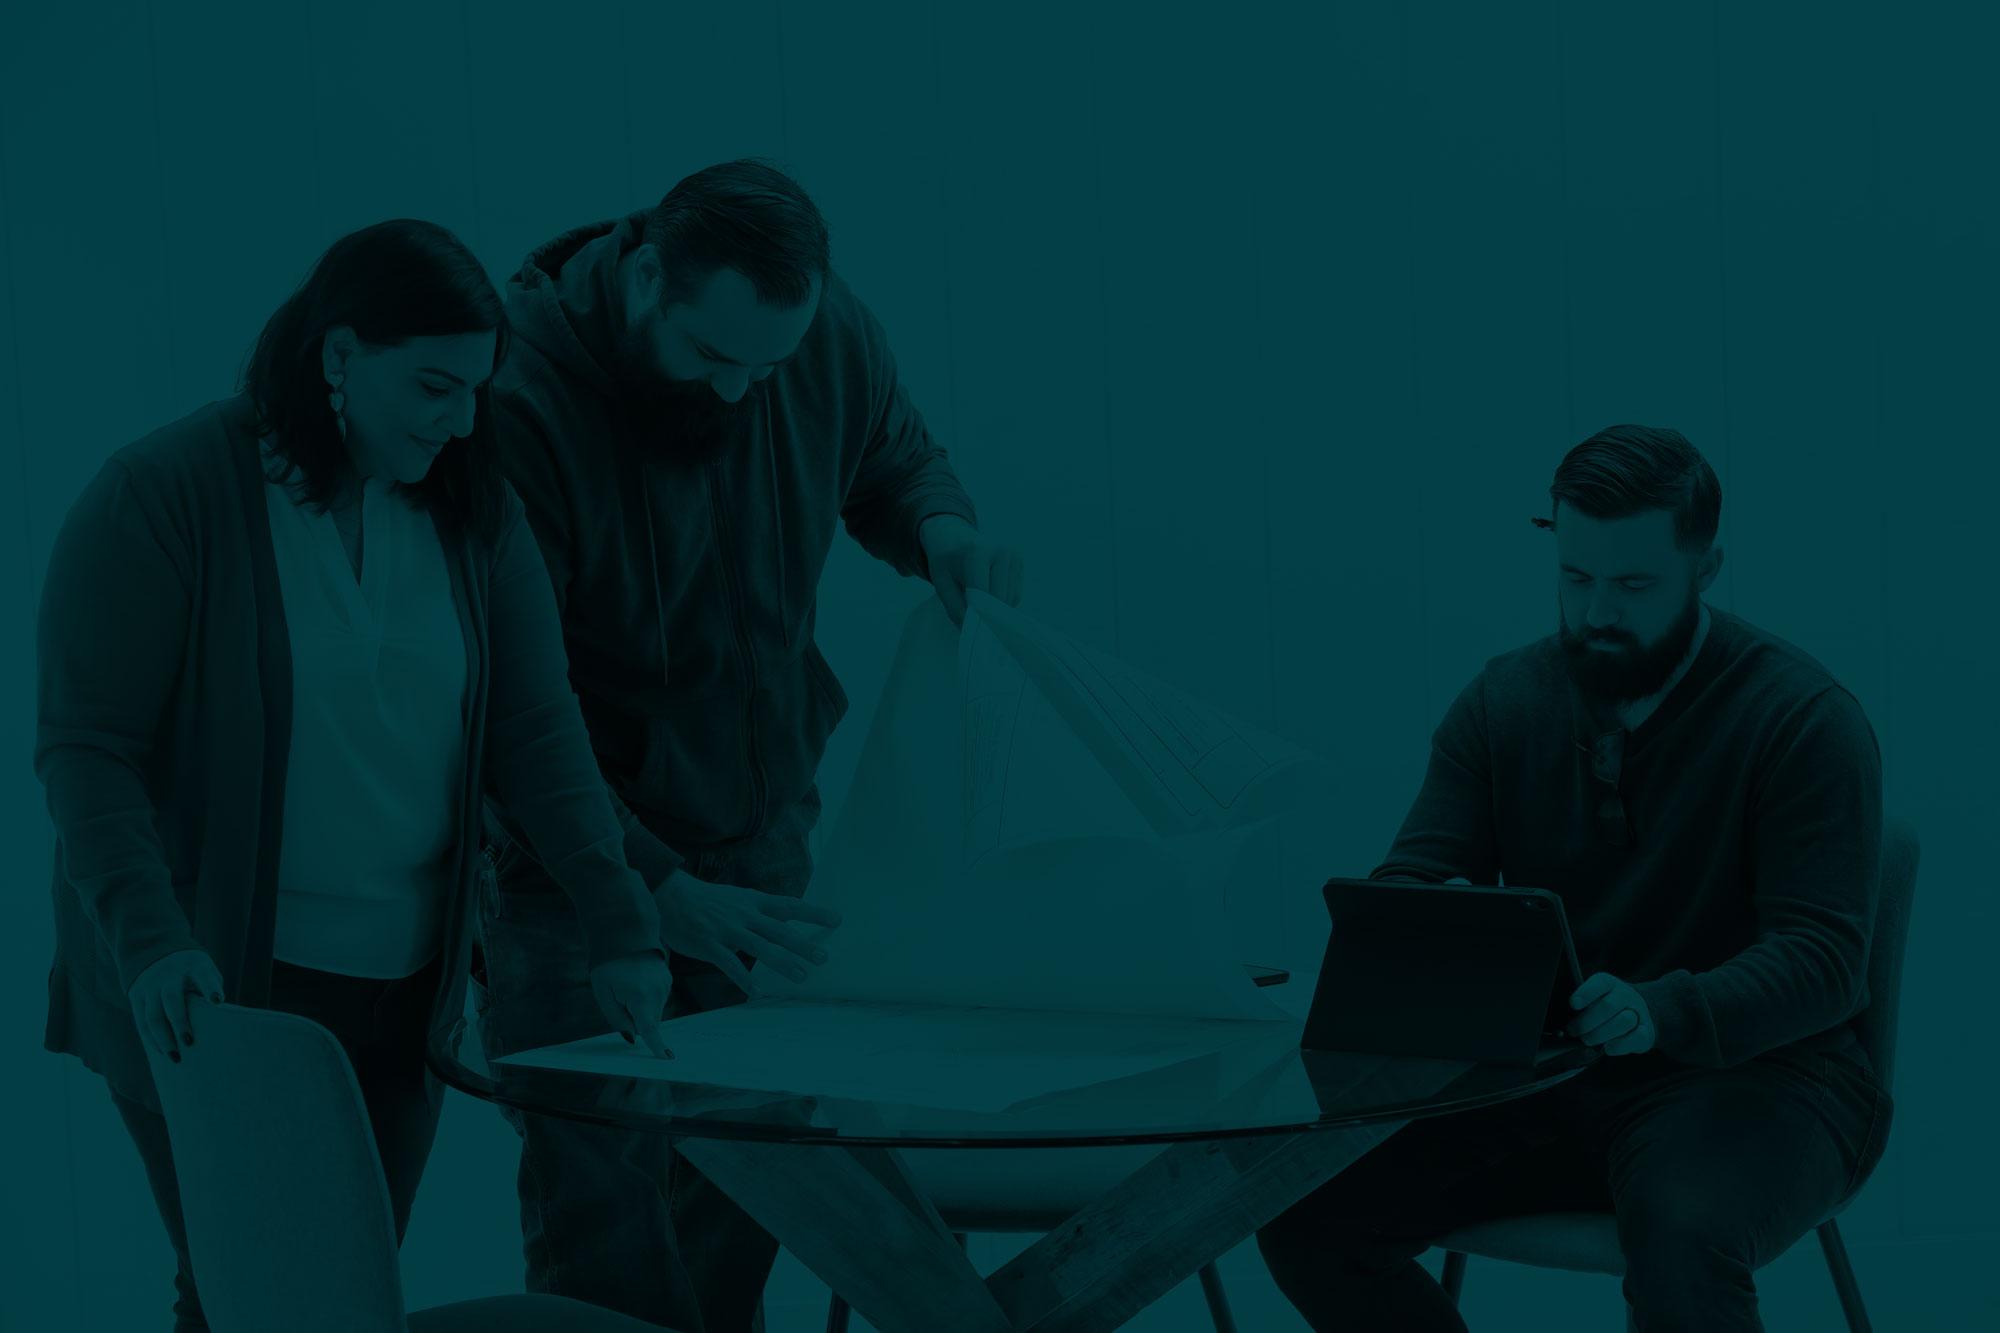 A group photo of the team at Brand Author including Zahra Cruzan, Ian Friedel and Keith Cruzan.